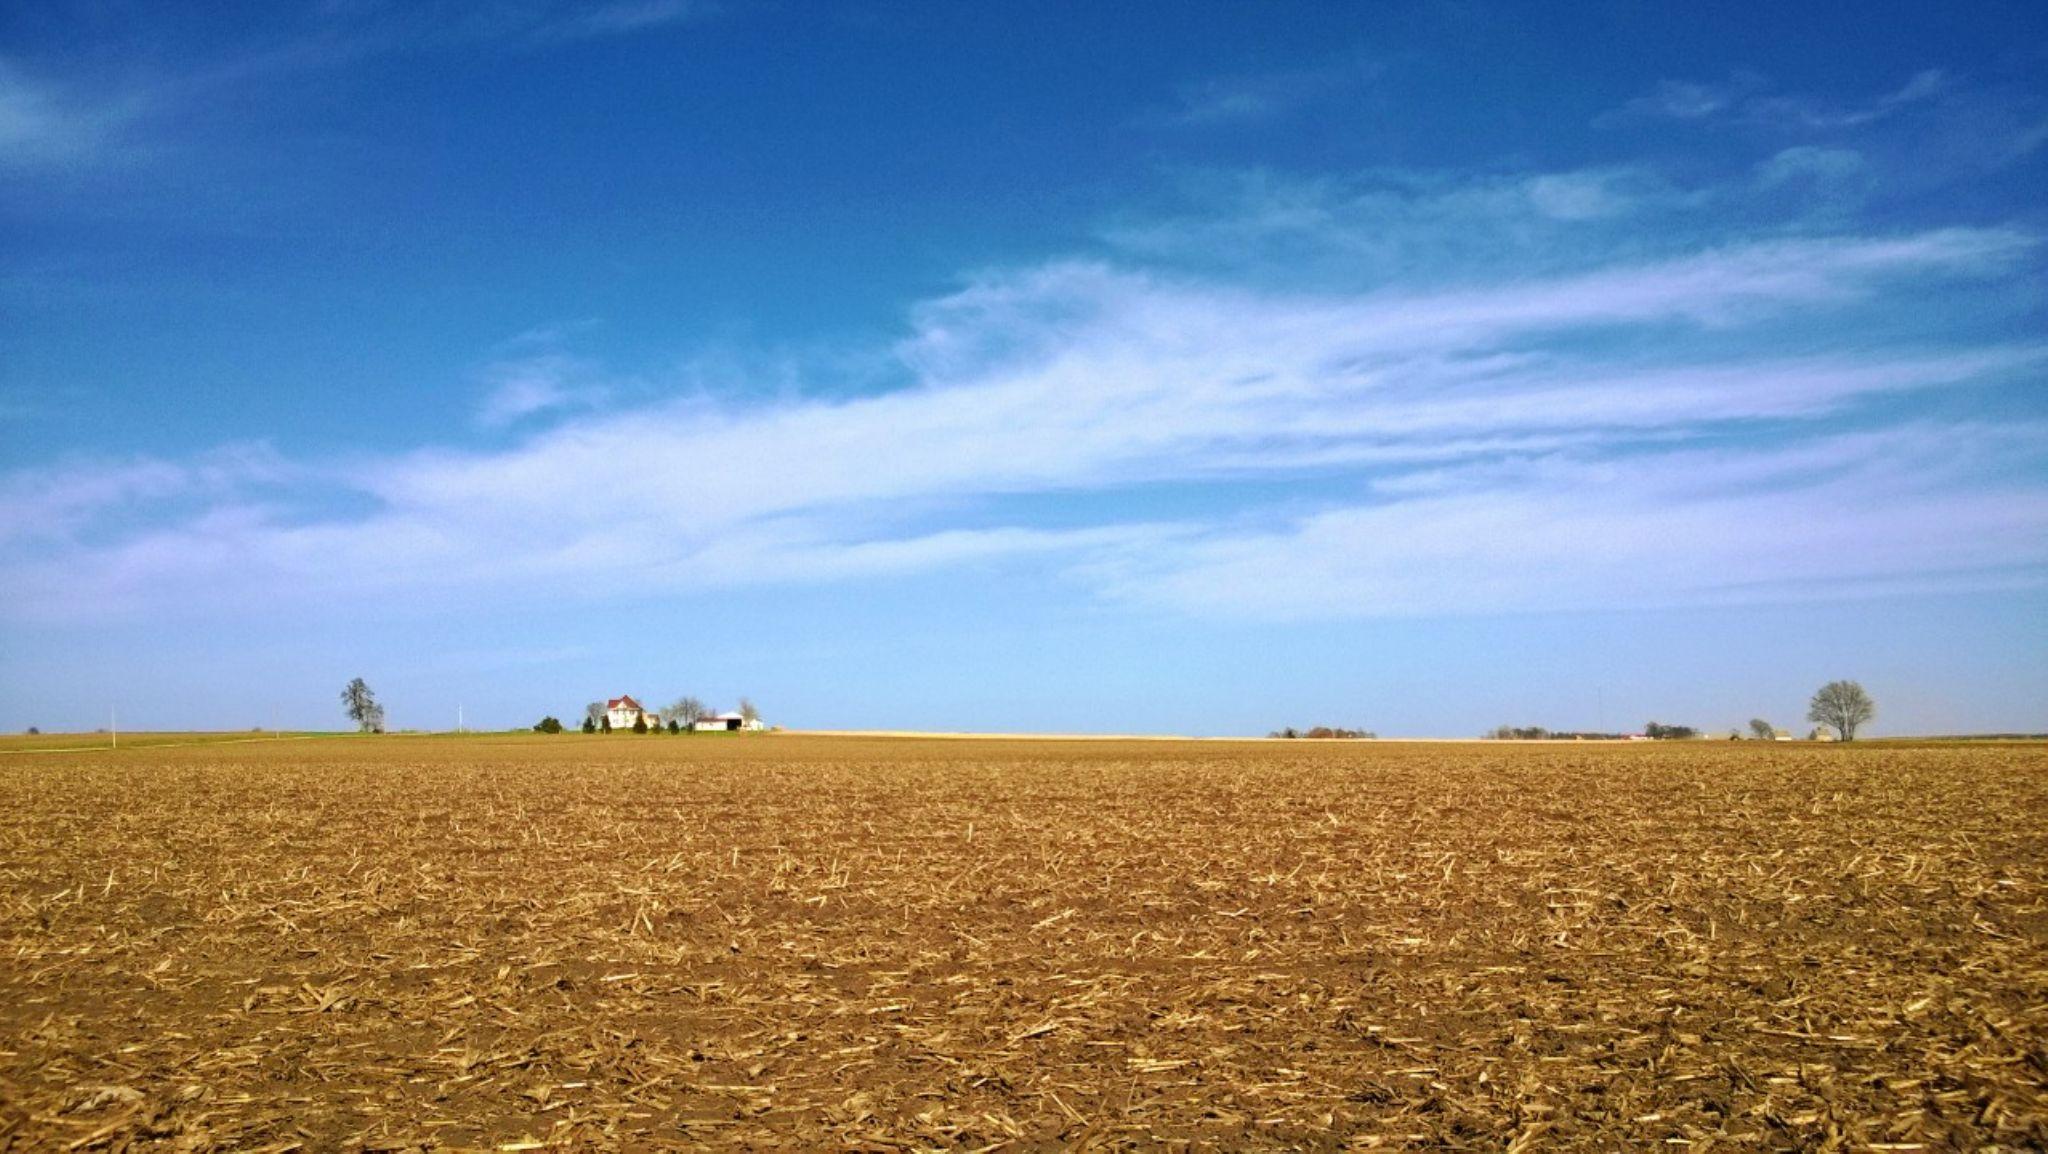 Soybean Fields by Danilo Almeida